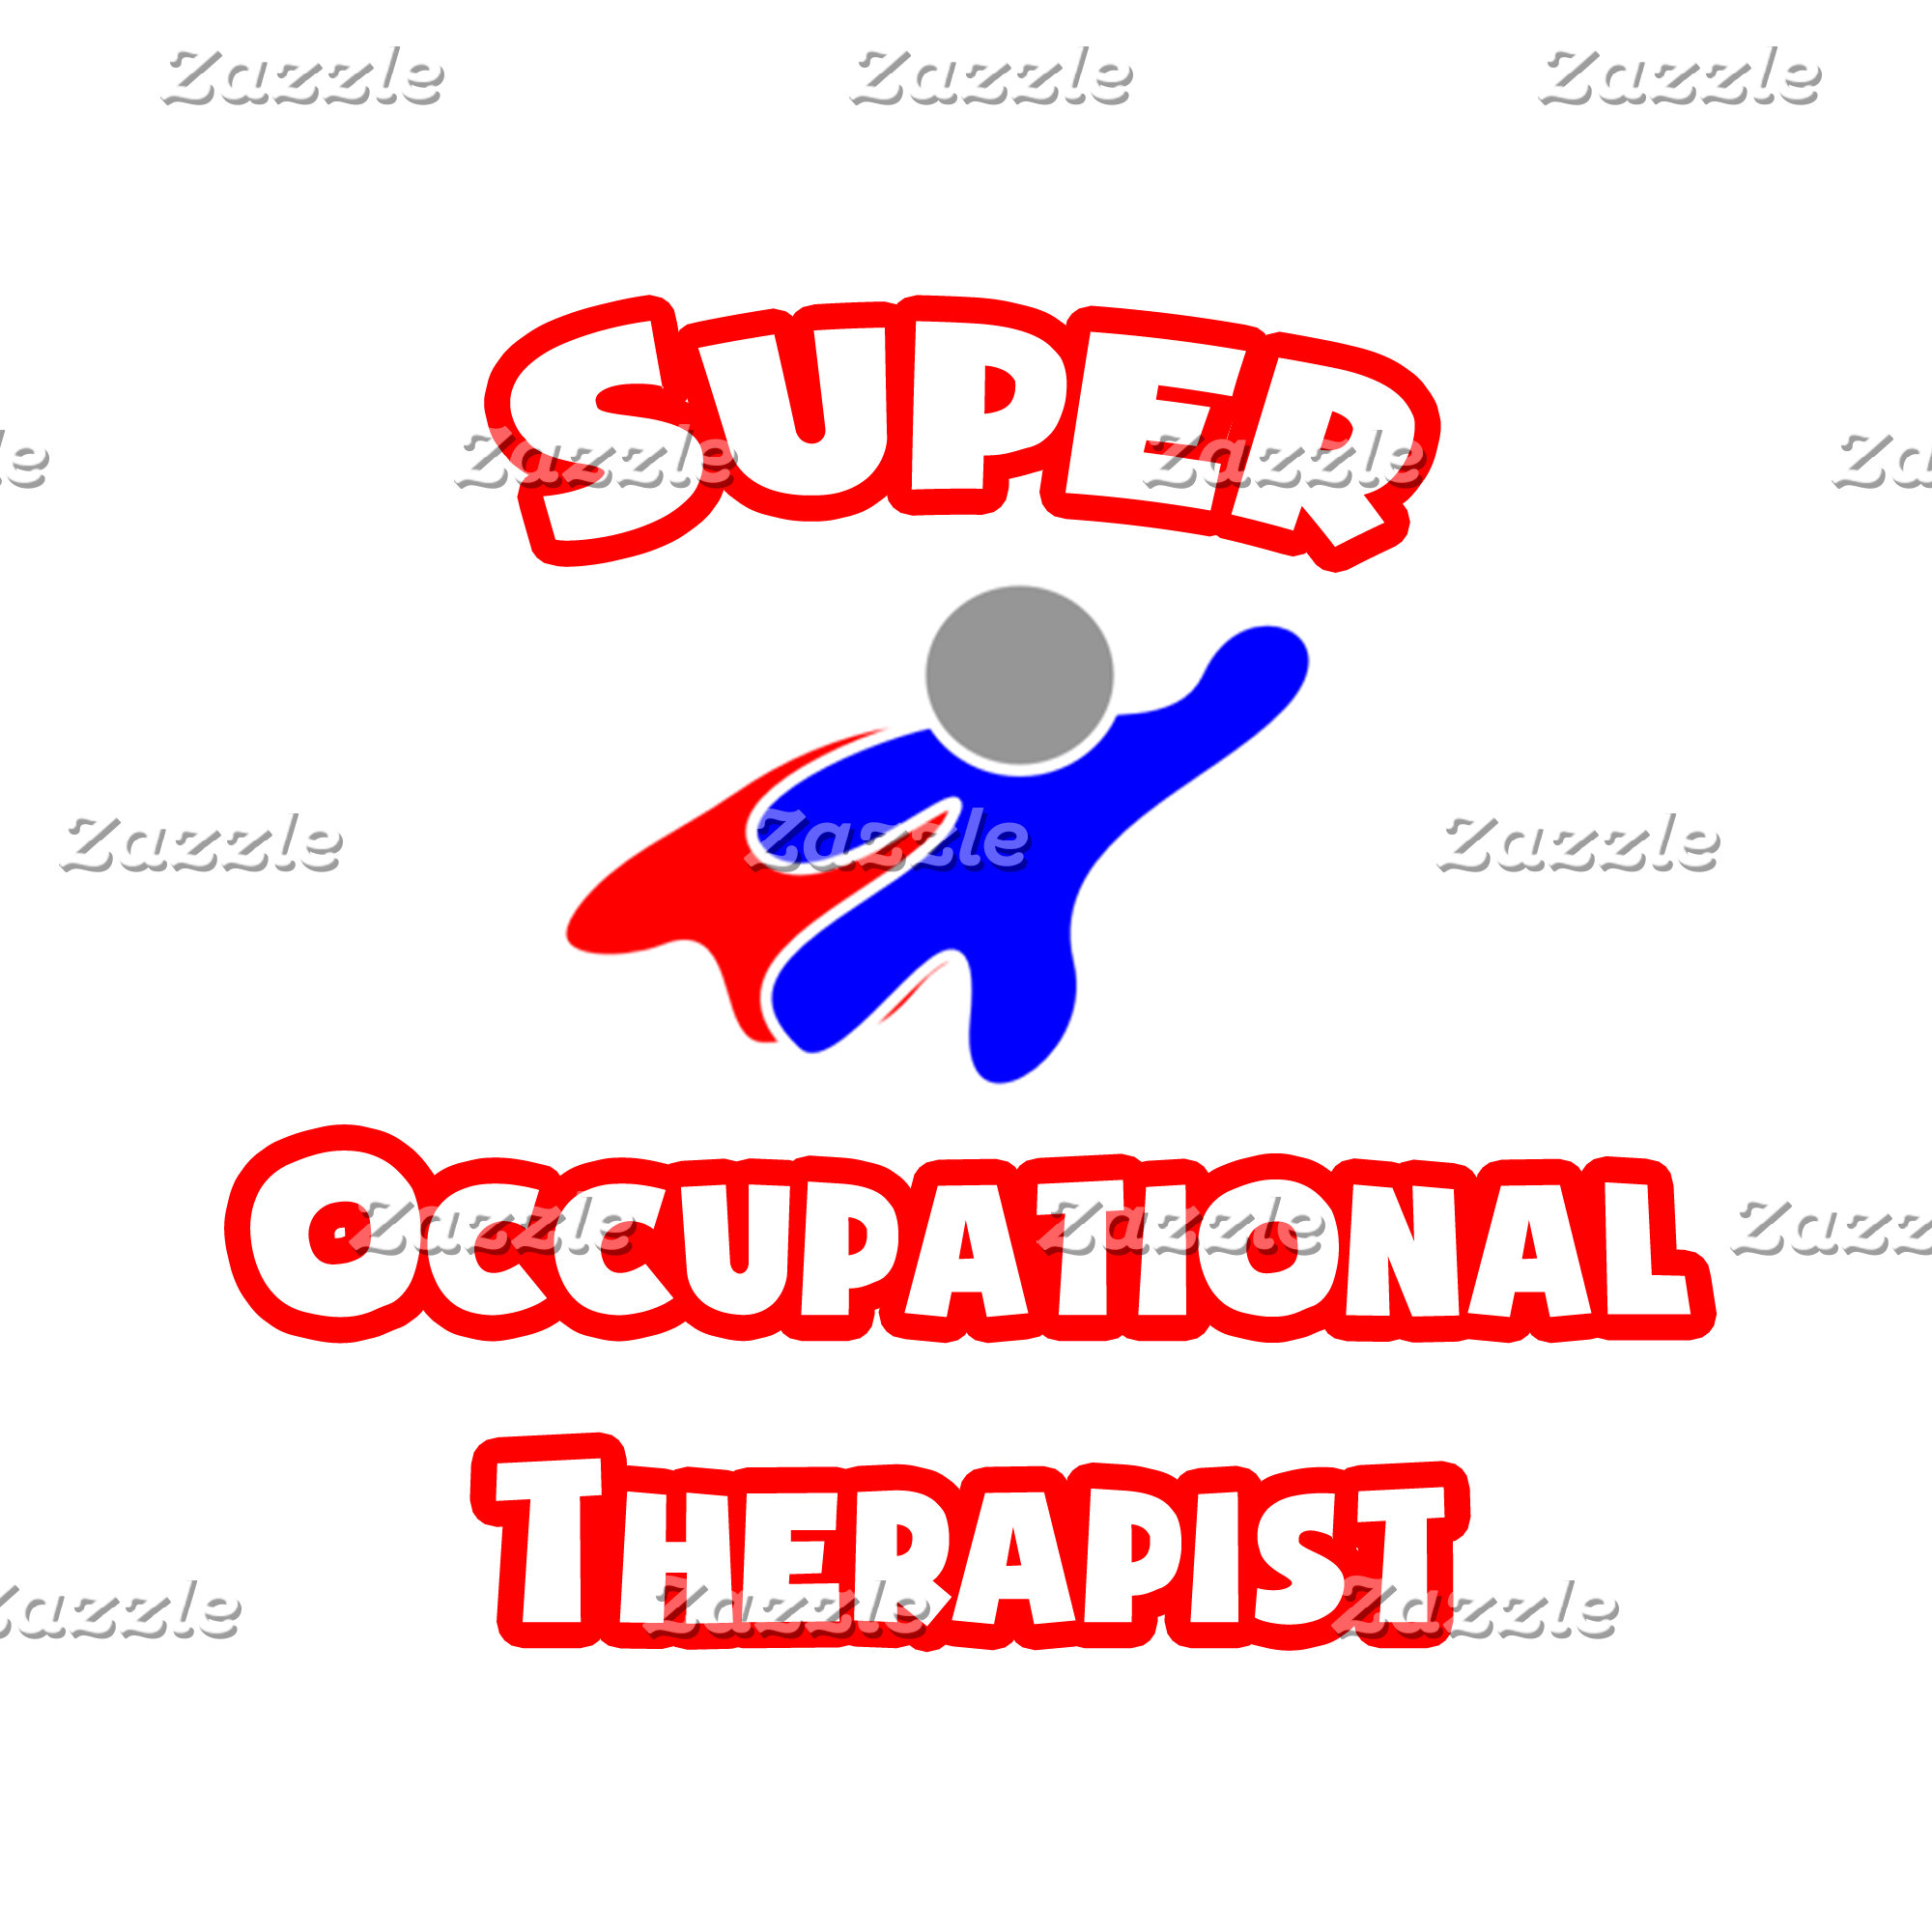 Super Occupational Therapist